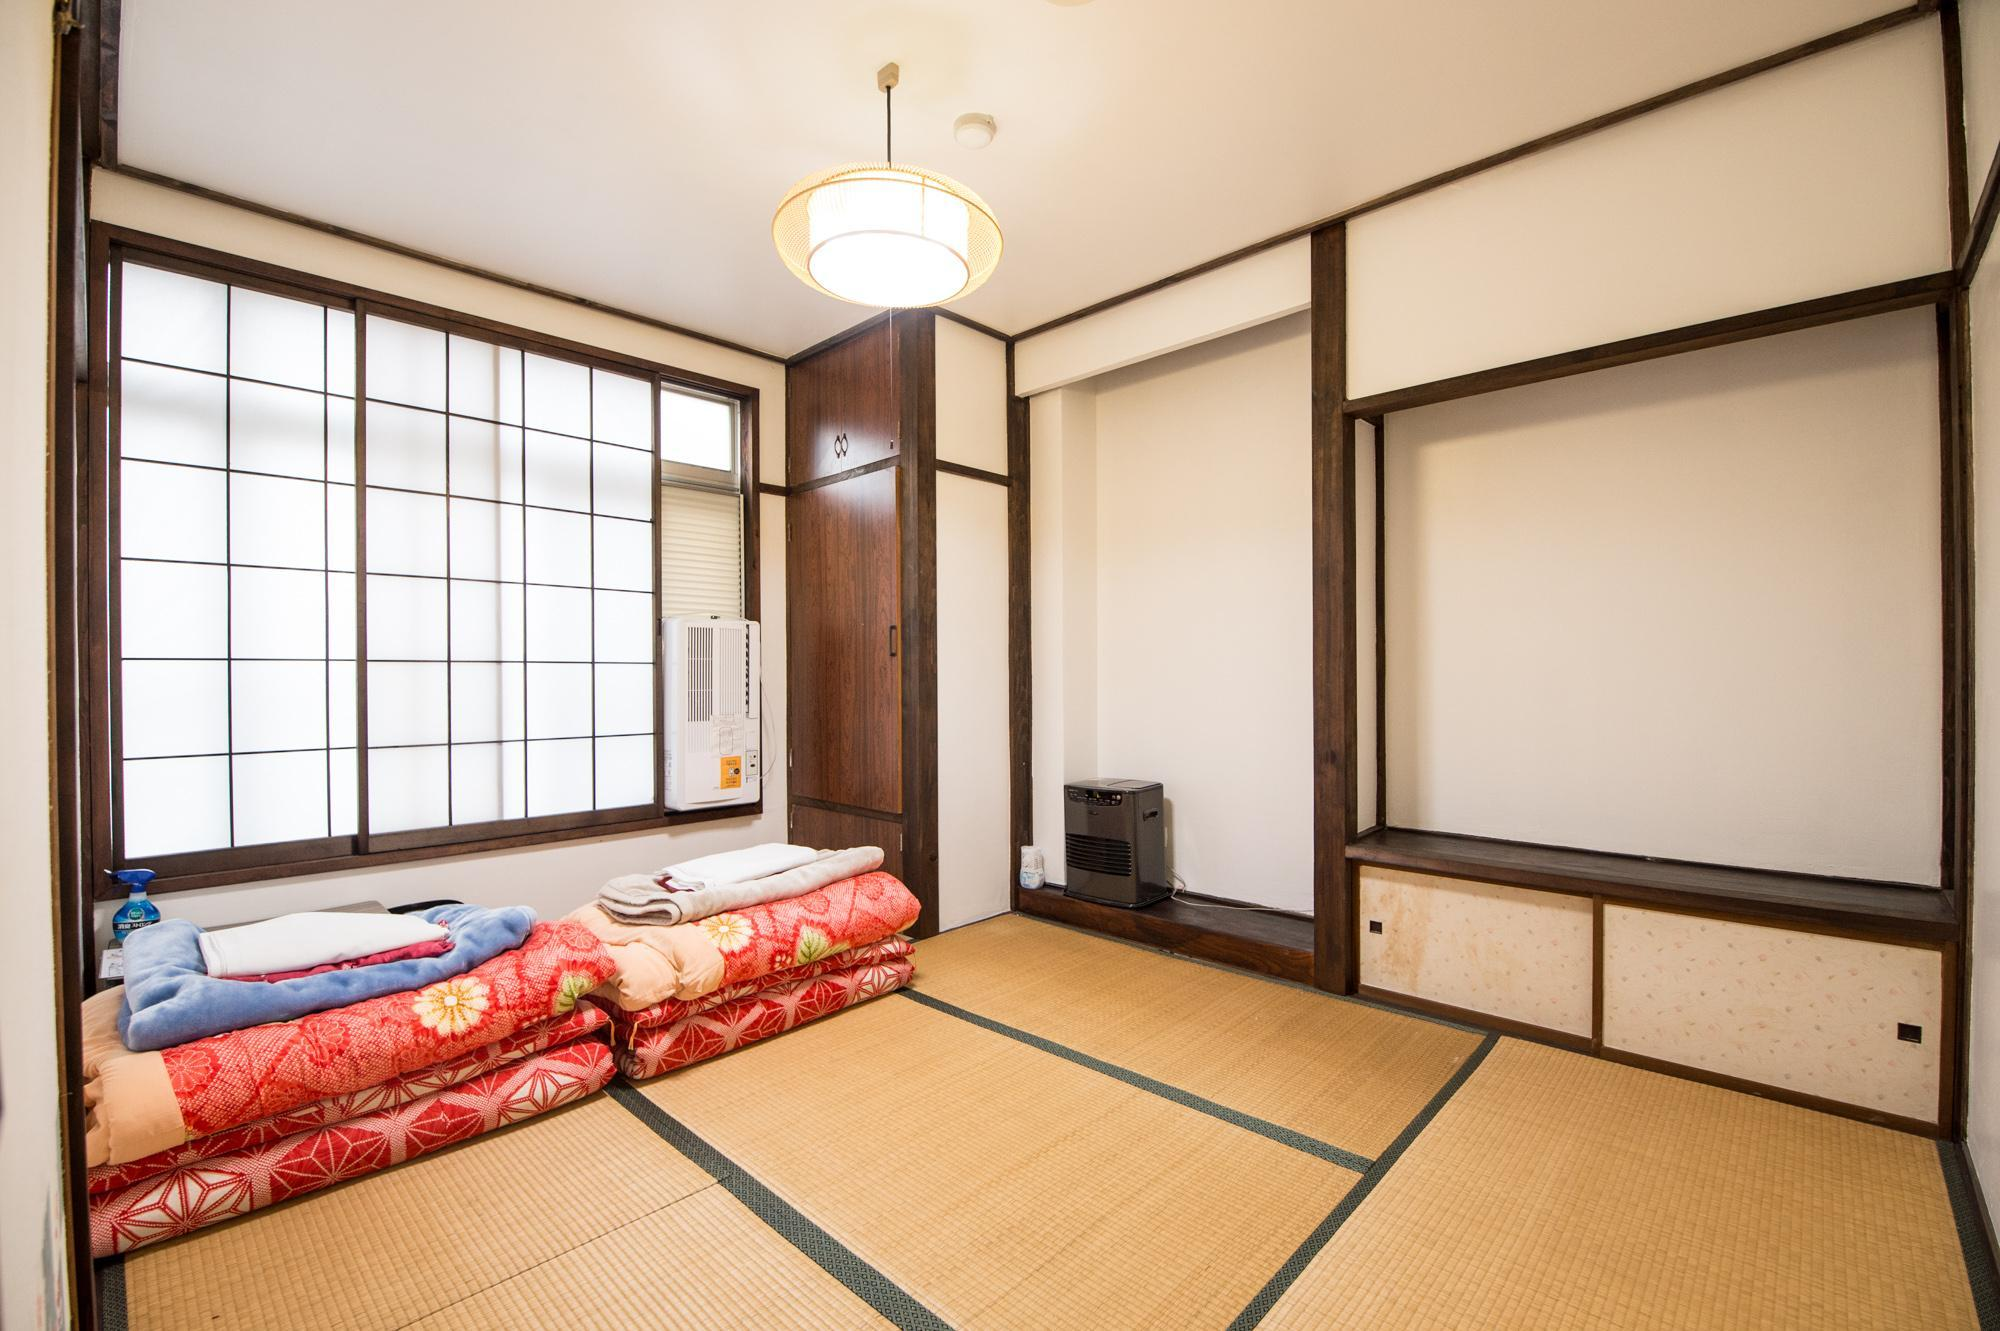 Sansan -Cafe and Bar & Backpackers-, Yuzawa